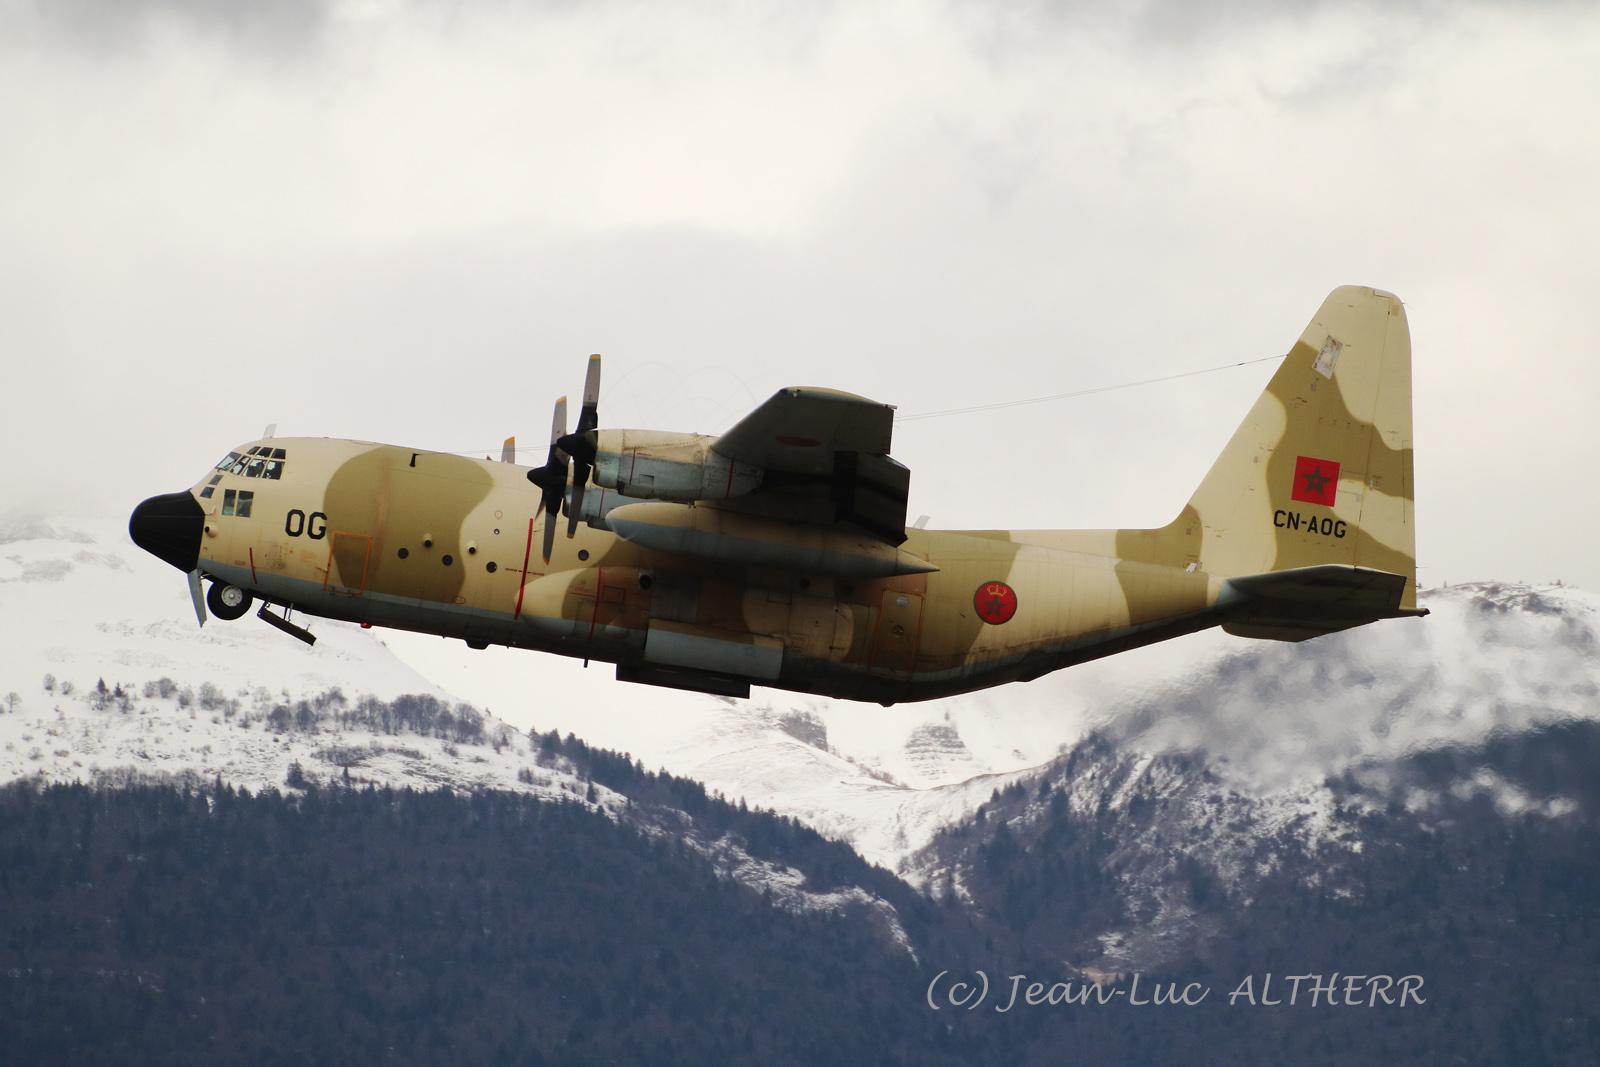 FRA: Photos d'avions de transport - Page 37 47317463531_f7d266aab8_o